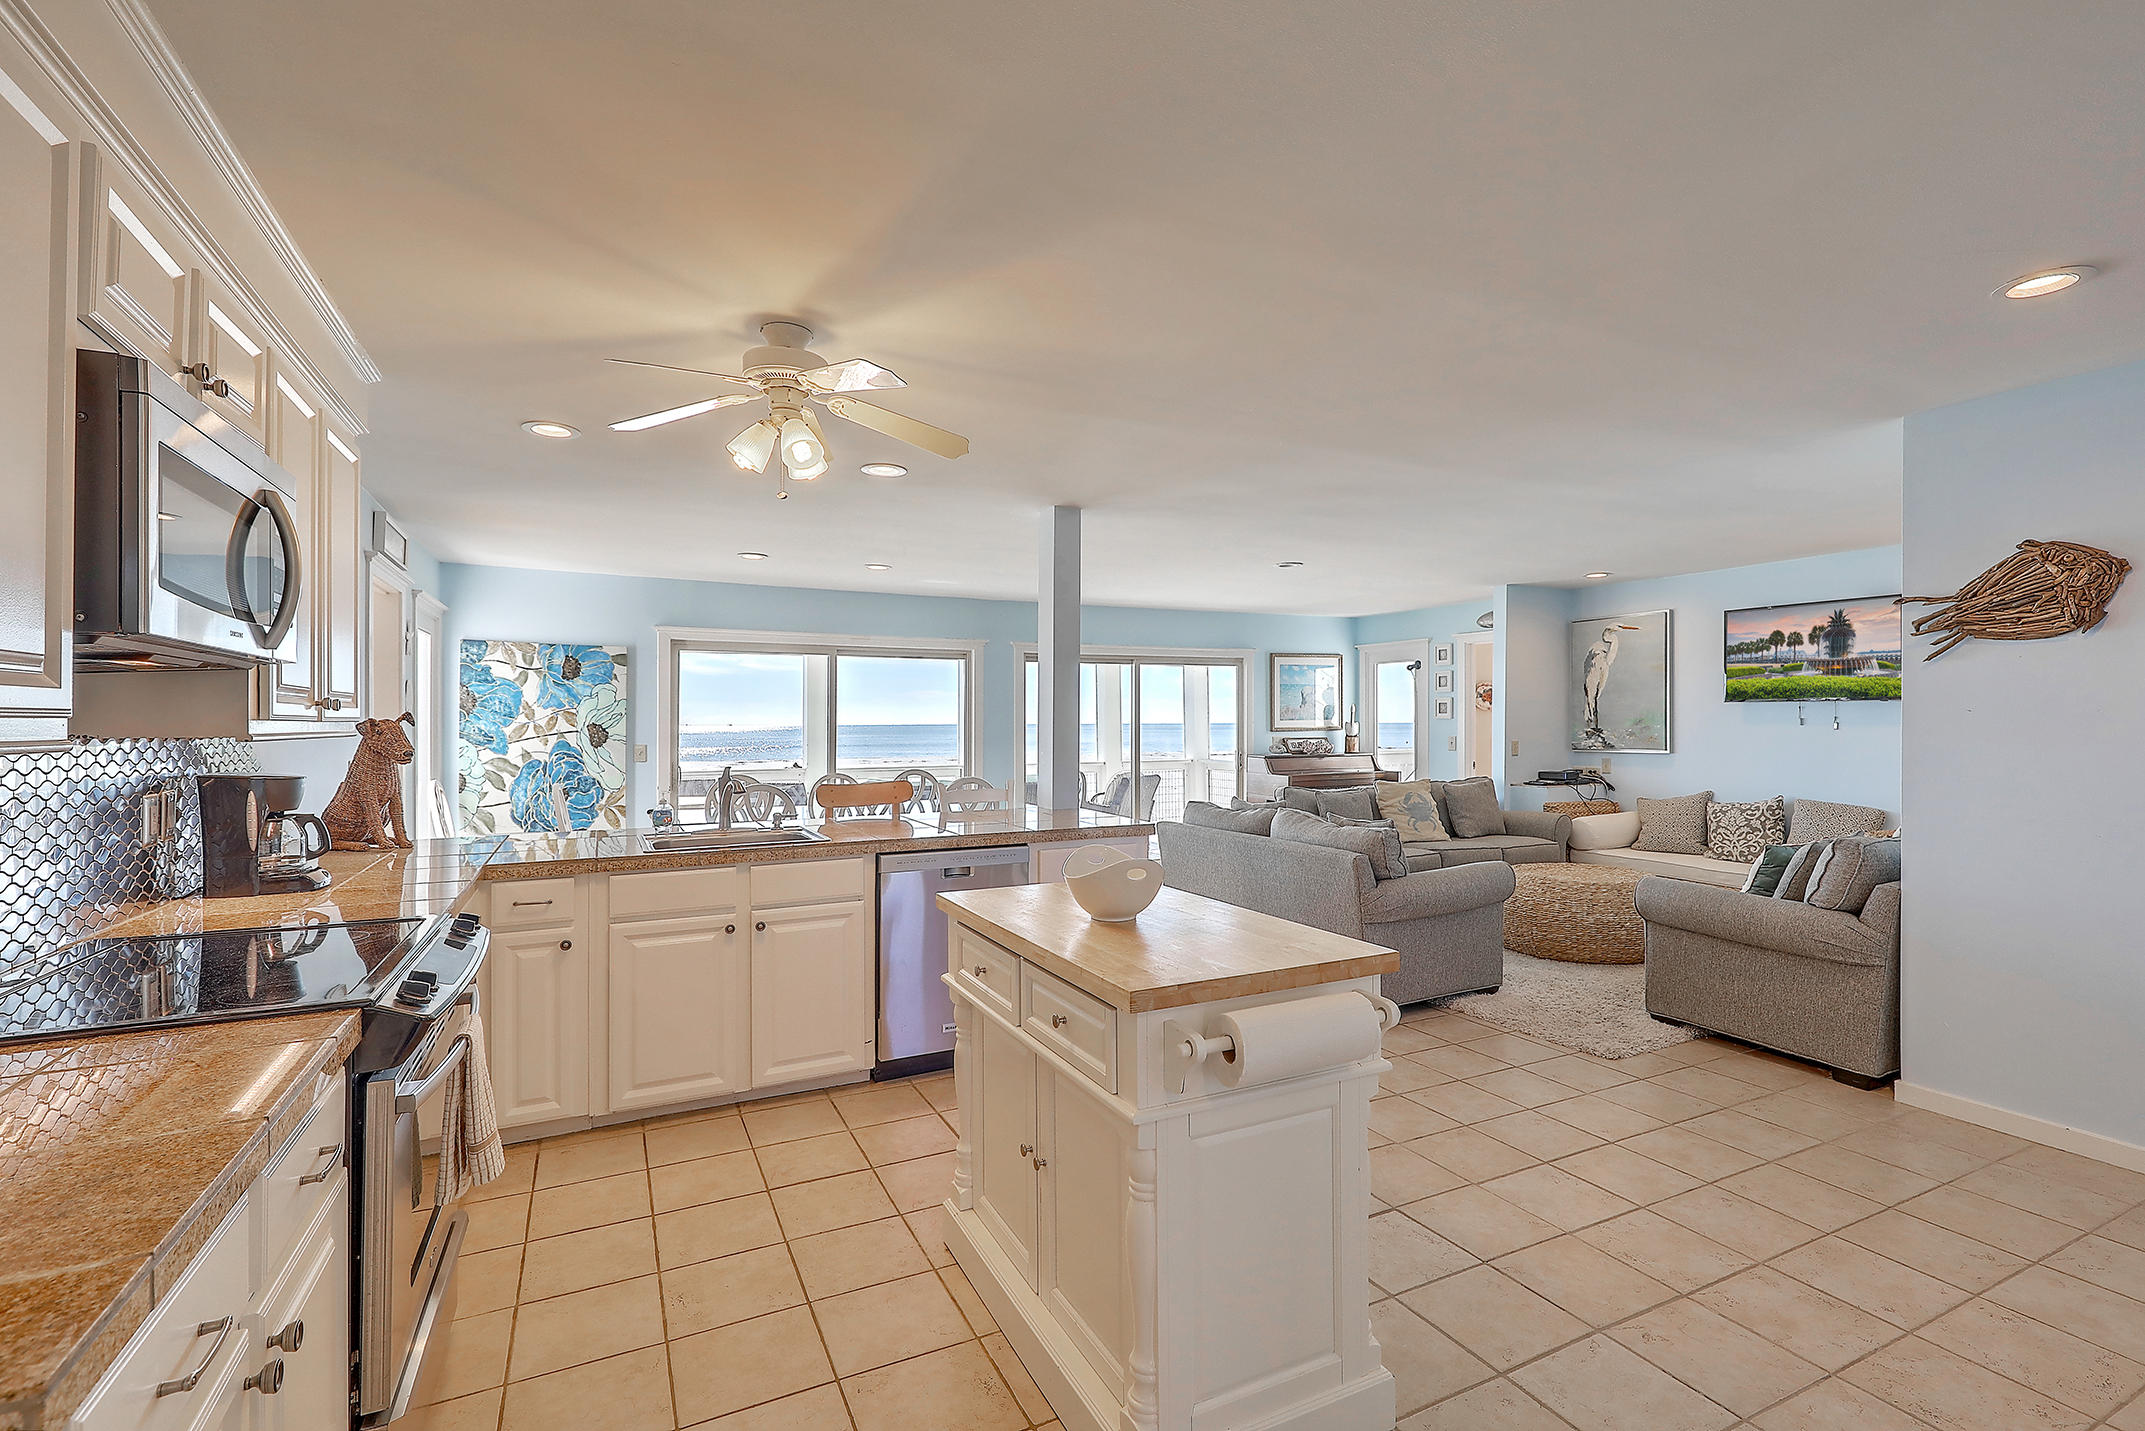 Wild Dunes Homes For Sale - 14 Beachwood East, Isle of Palms, SC - 9